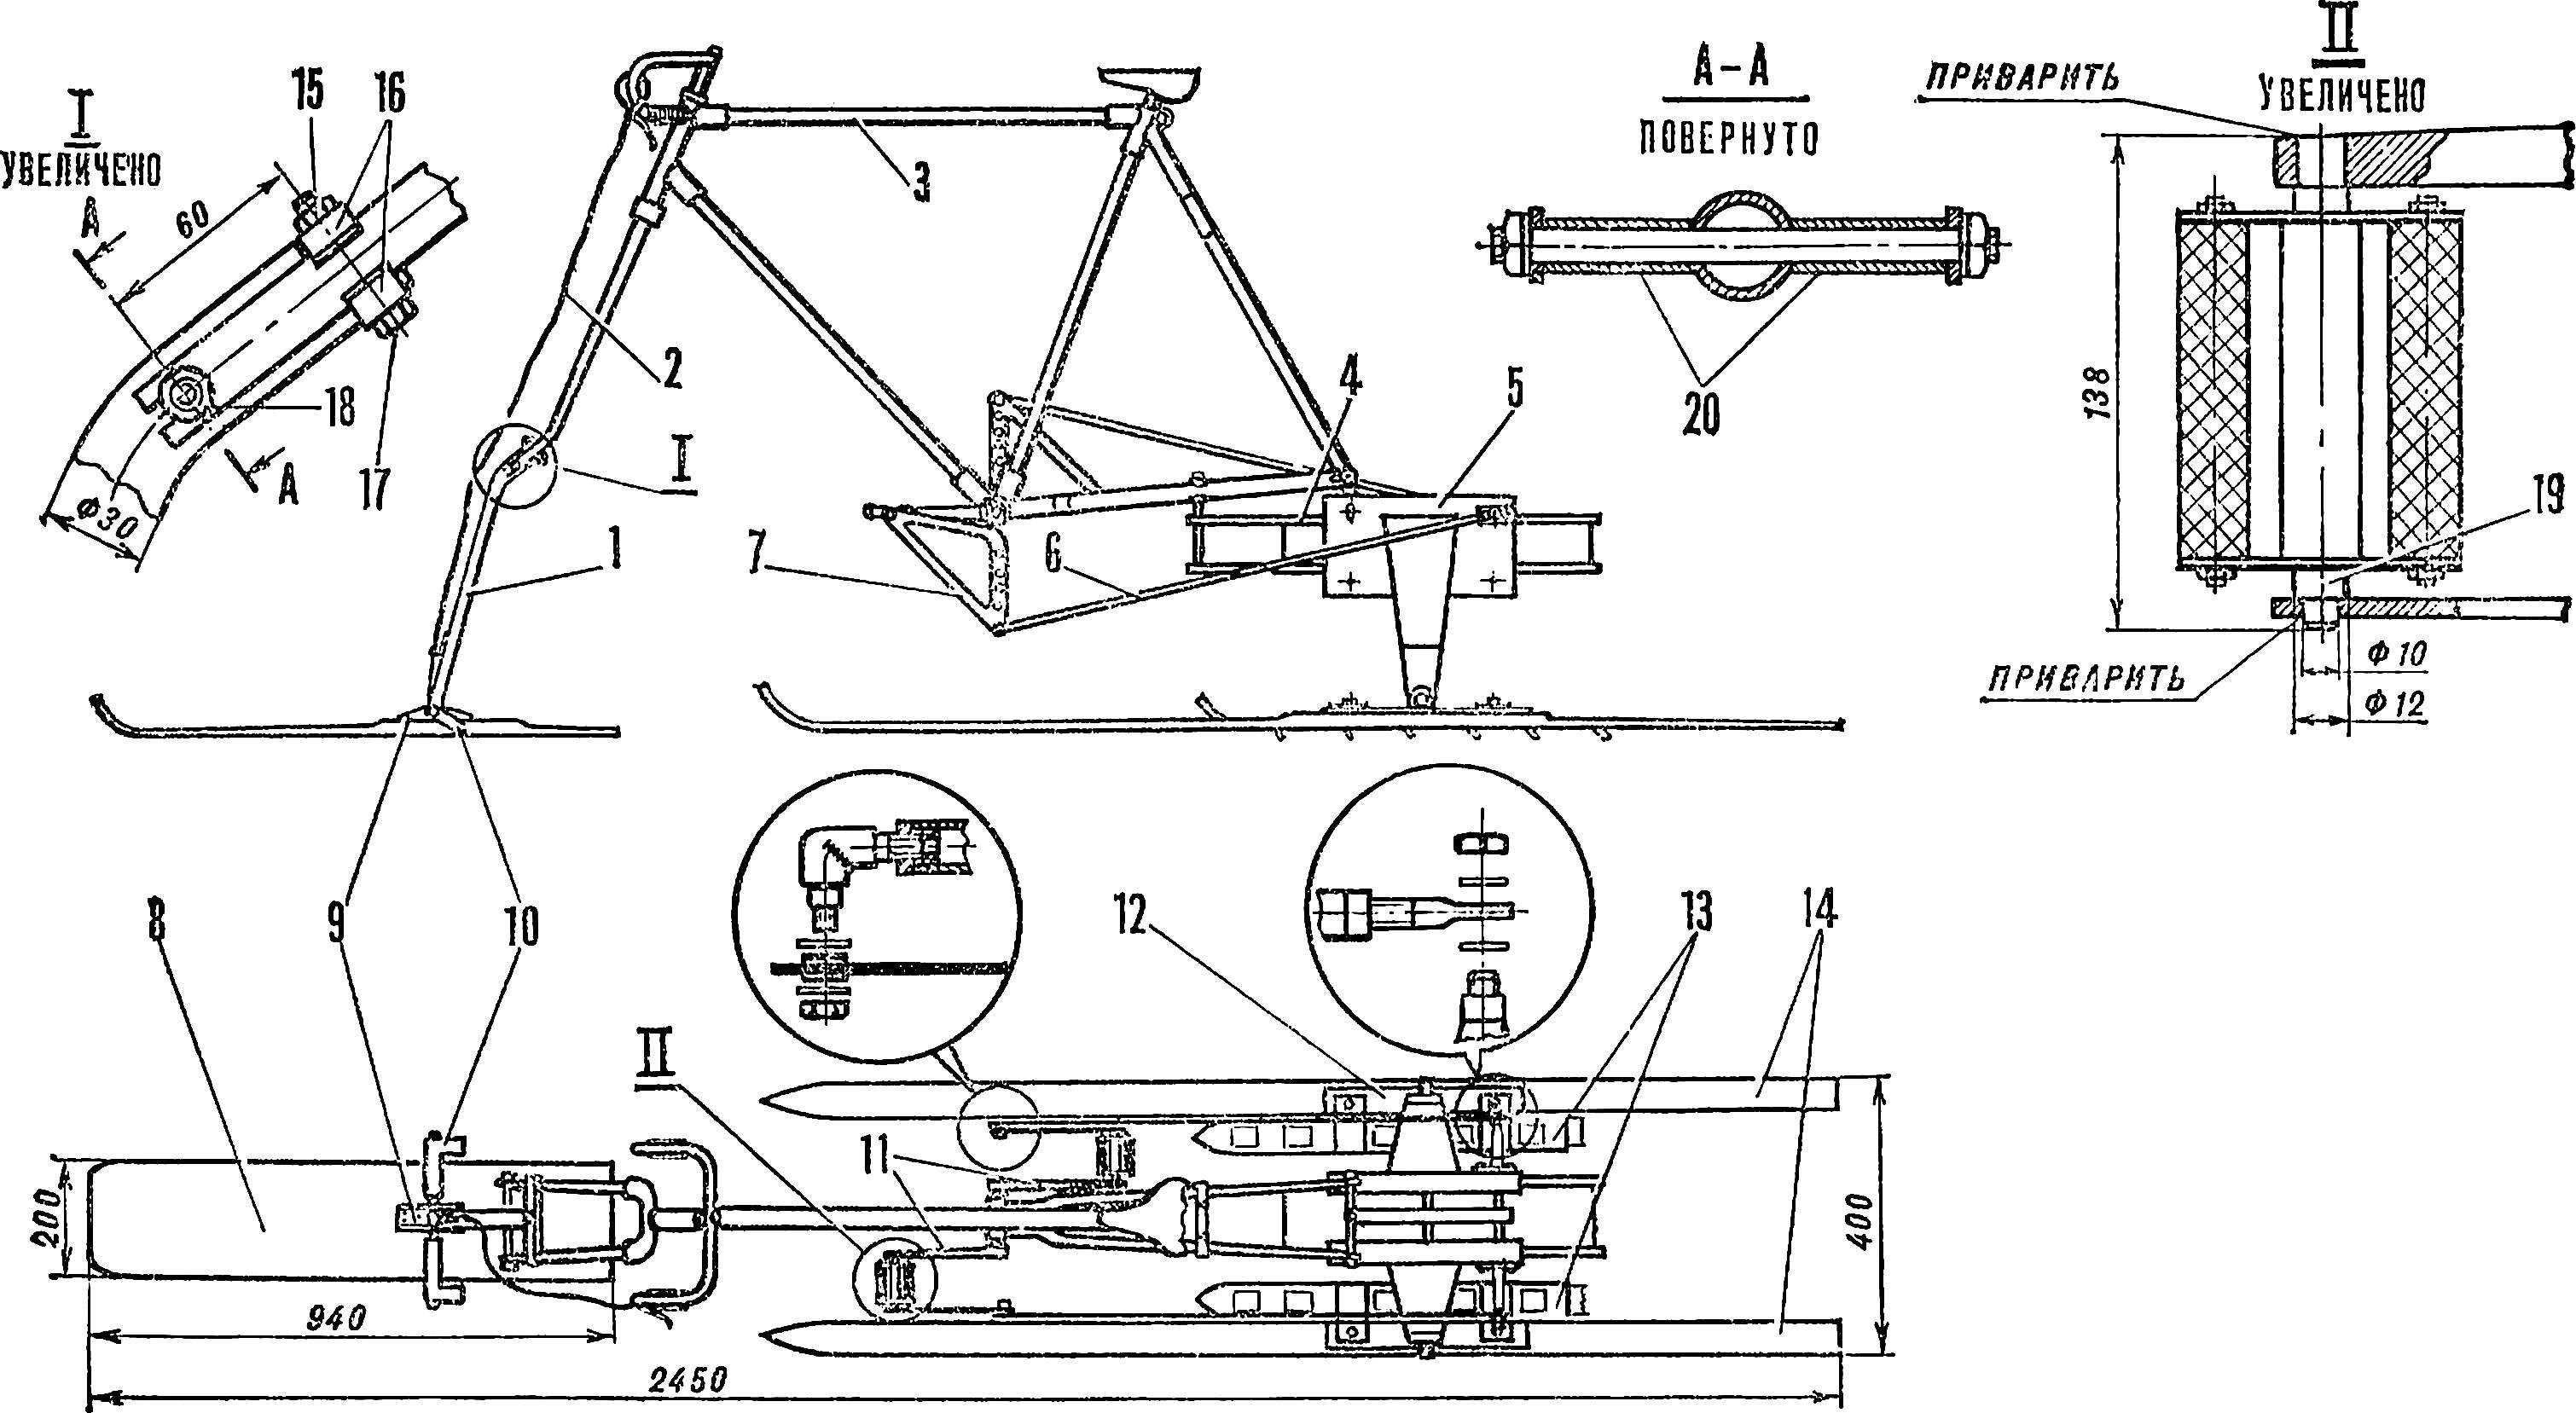 Fig. 1. Willigerod.